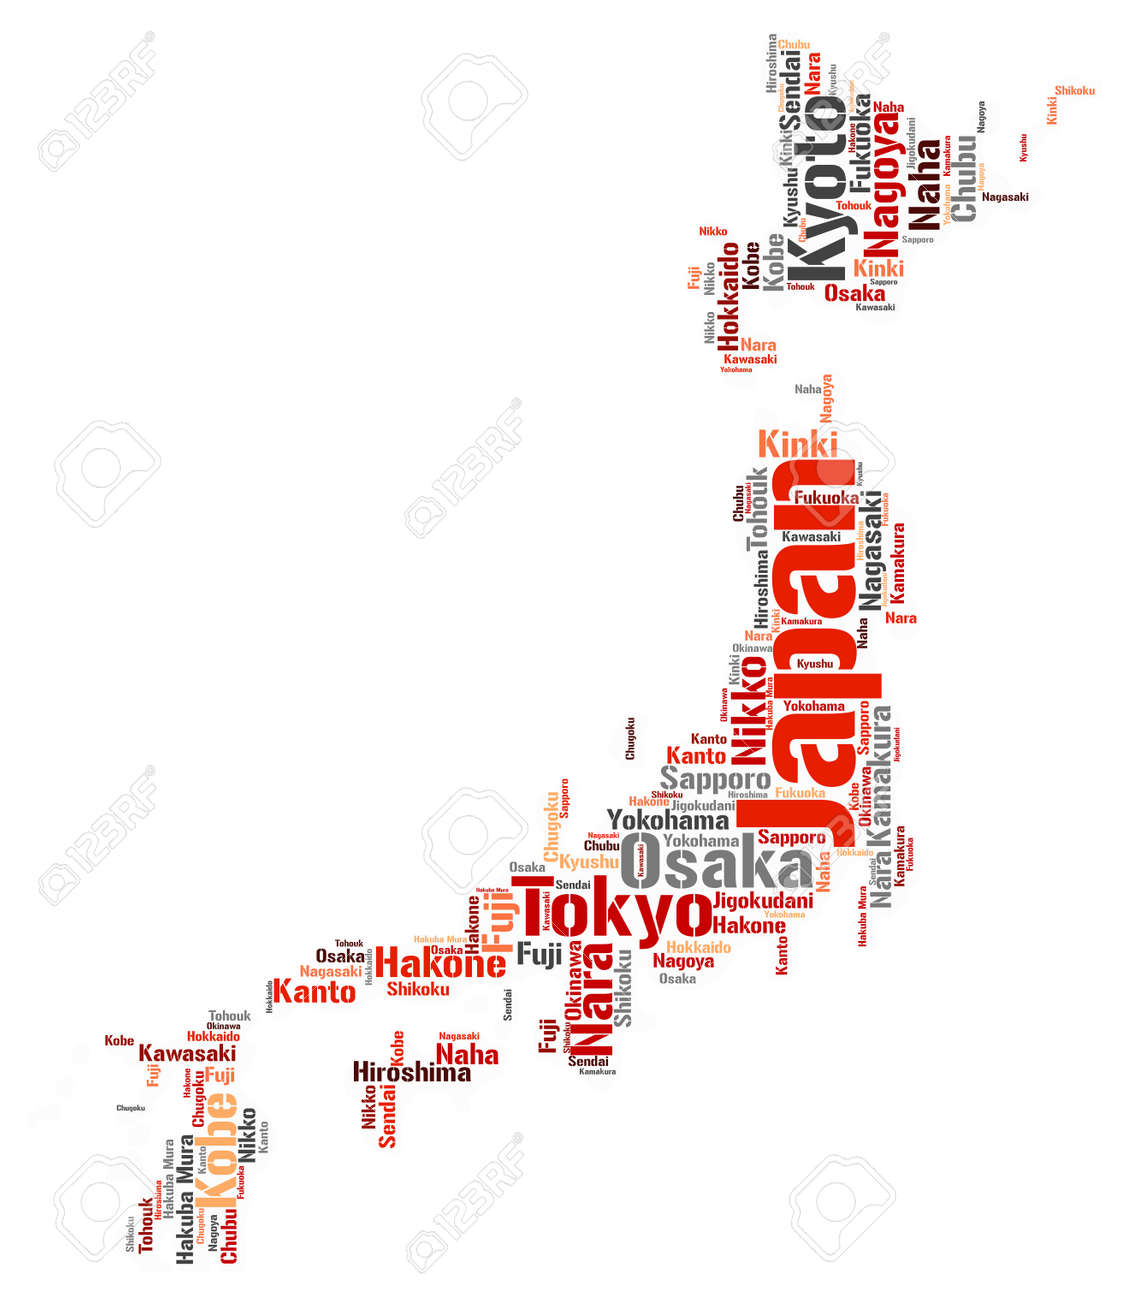 Japan map silhouette word cloud with most por travel destinations on hyogo japan, yokota japan, winter in japan, kawasaki japan, info about japan, world map japan, languages spoken in japan, hakone japan, kanagawa japan, nikko japan, gifu japan, takayama japan, printable map japan, honshu japan, hiroshima japan, sendai japan, mountains in japan, nagoya japan, hamamatsu japan,